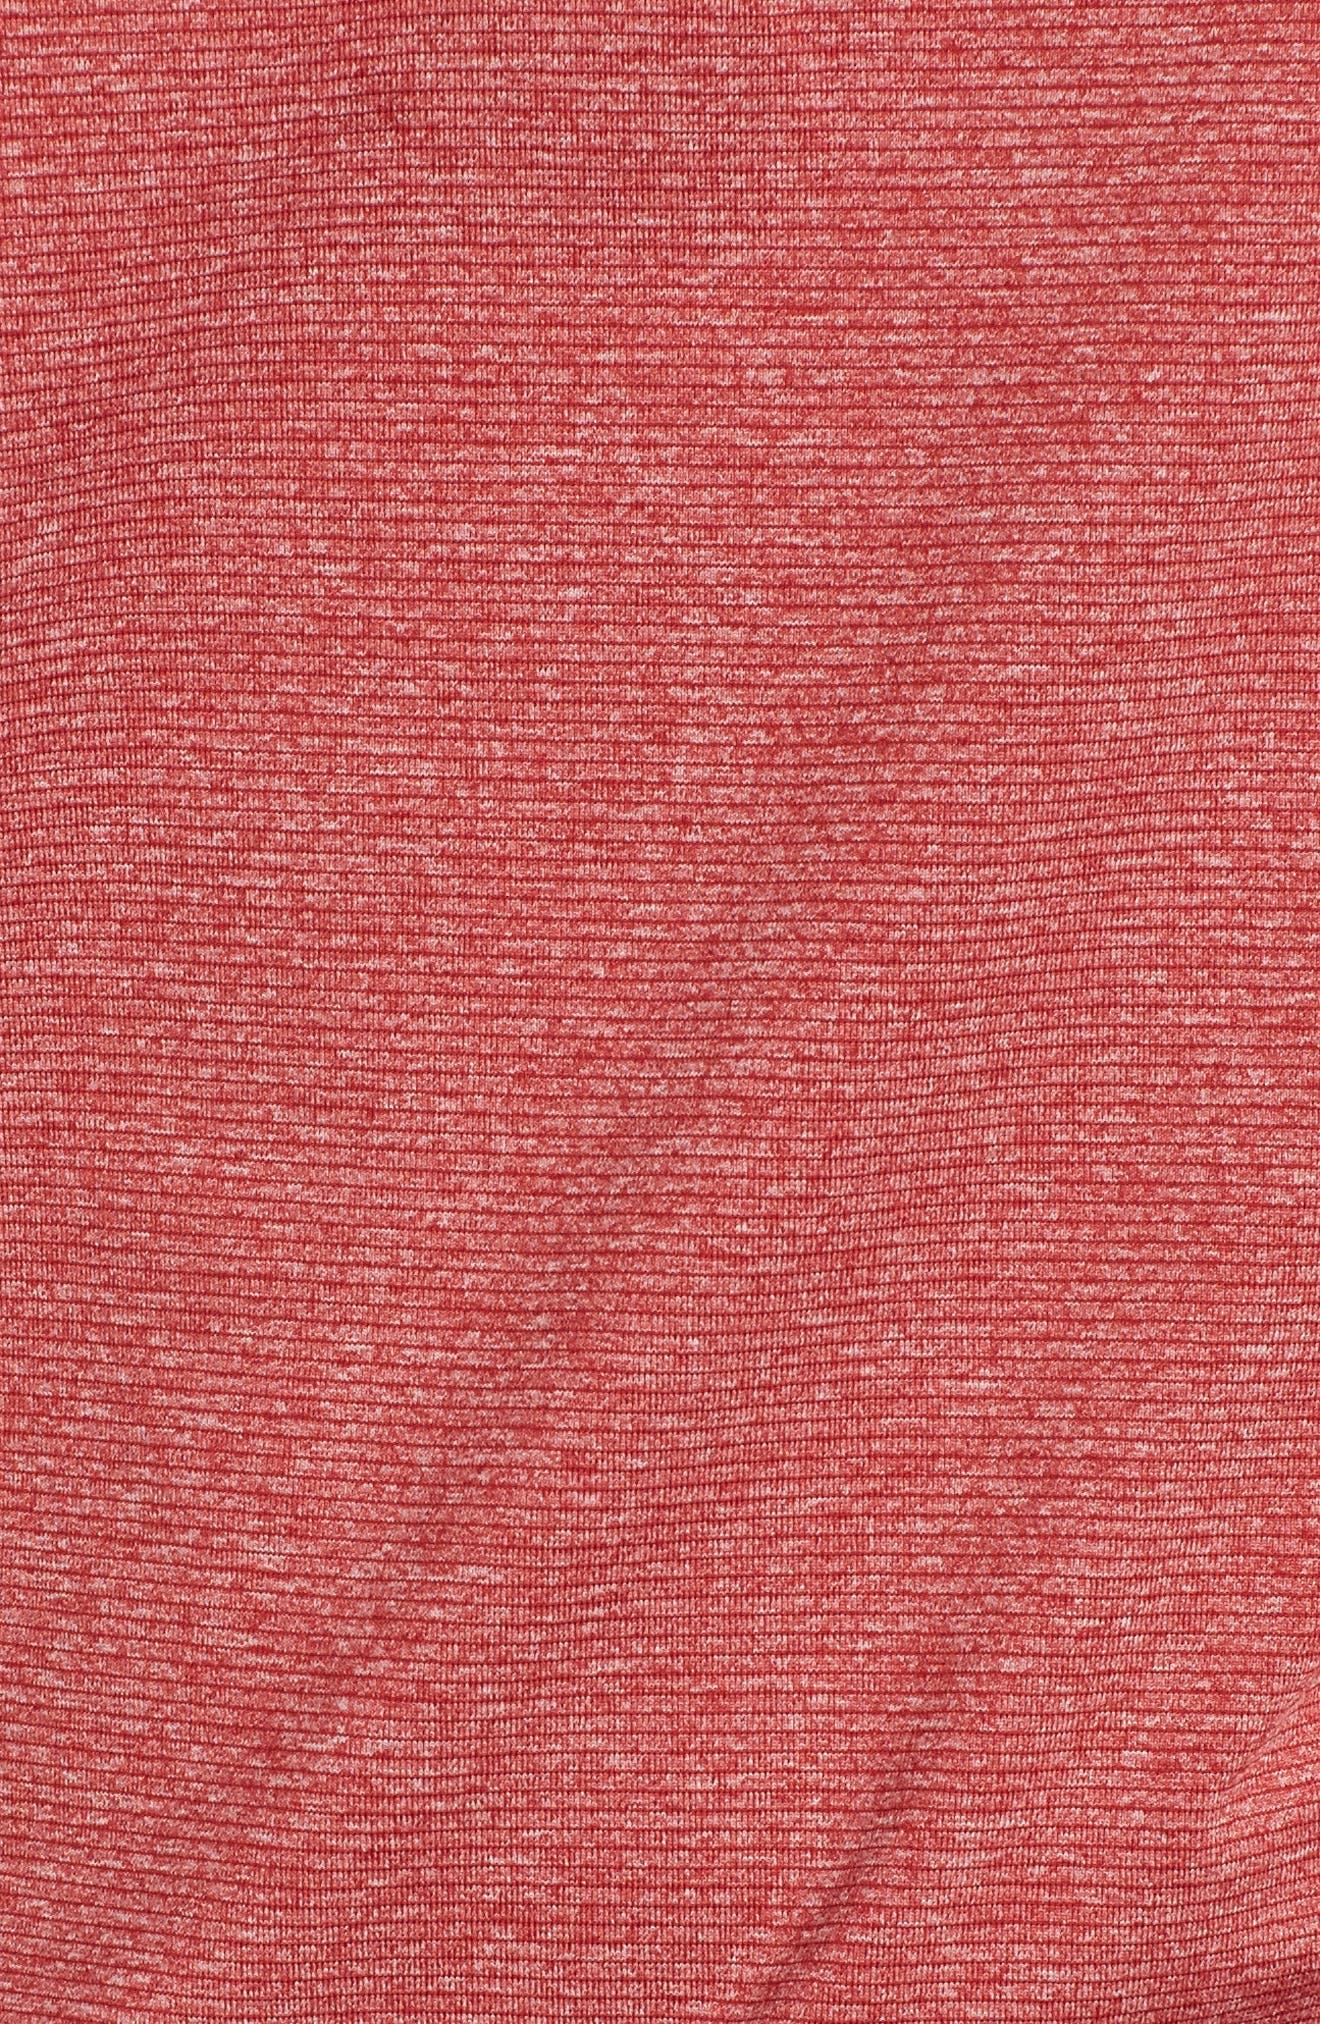 Shoreline - Arizona Cardinals Half Zip Pullover,                             Alternate thumbnail 5, color,                             Cardinal Red Heather